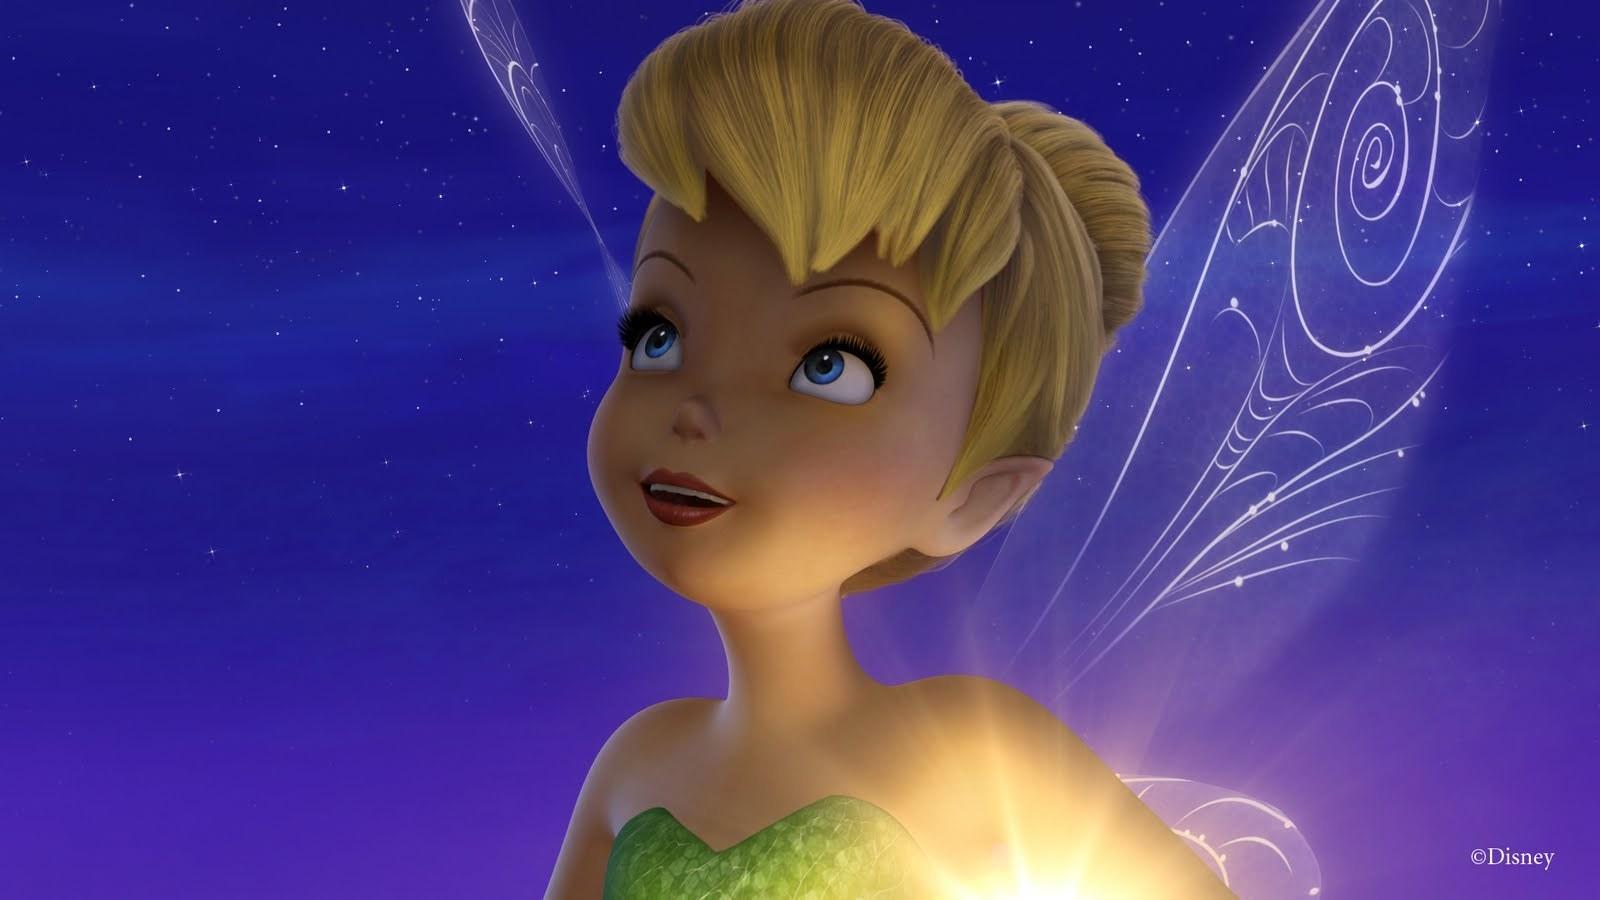 TinkerBell - LOVE ANGELS Image (22183770) - Fanpop